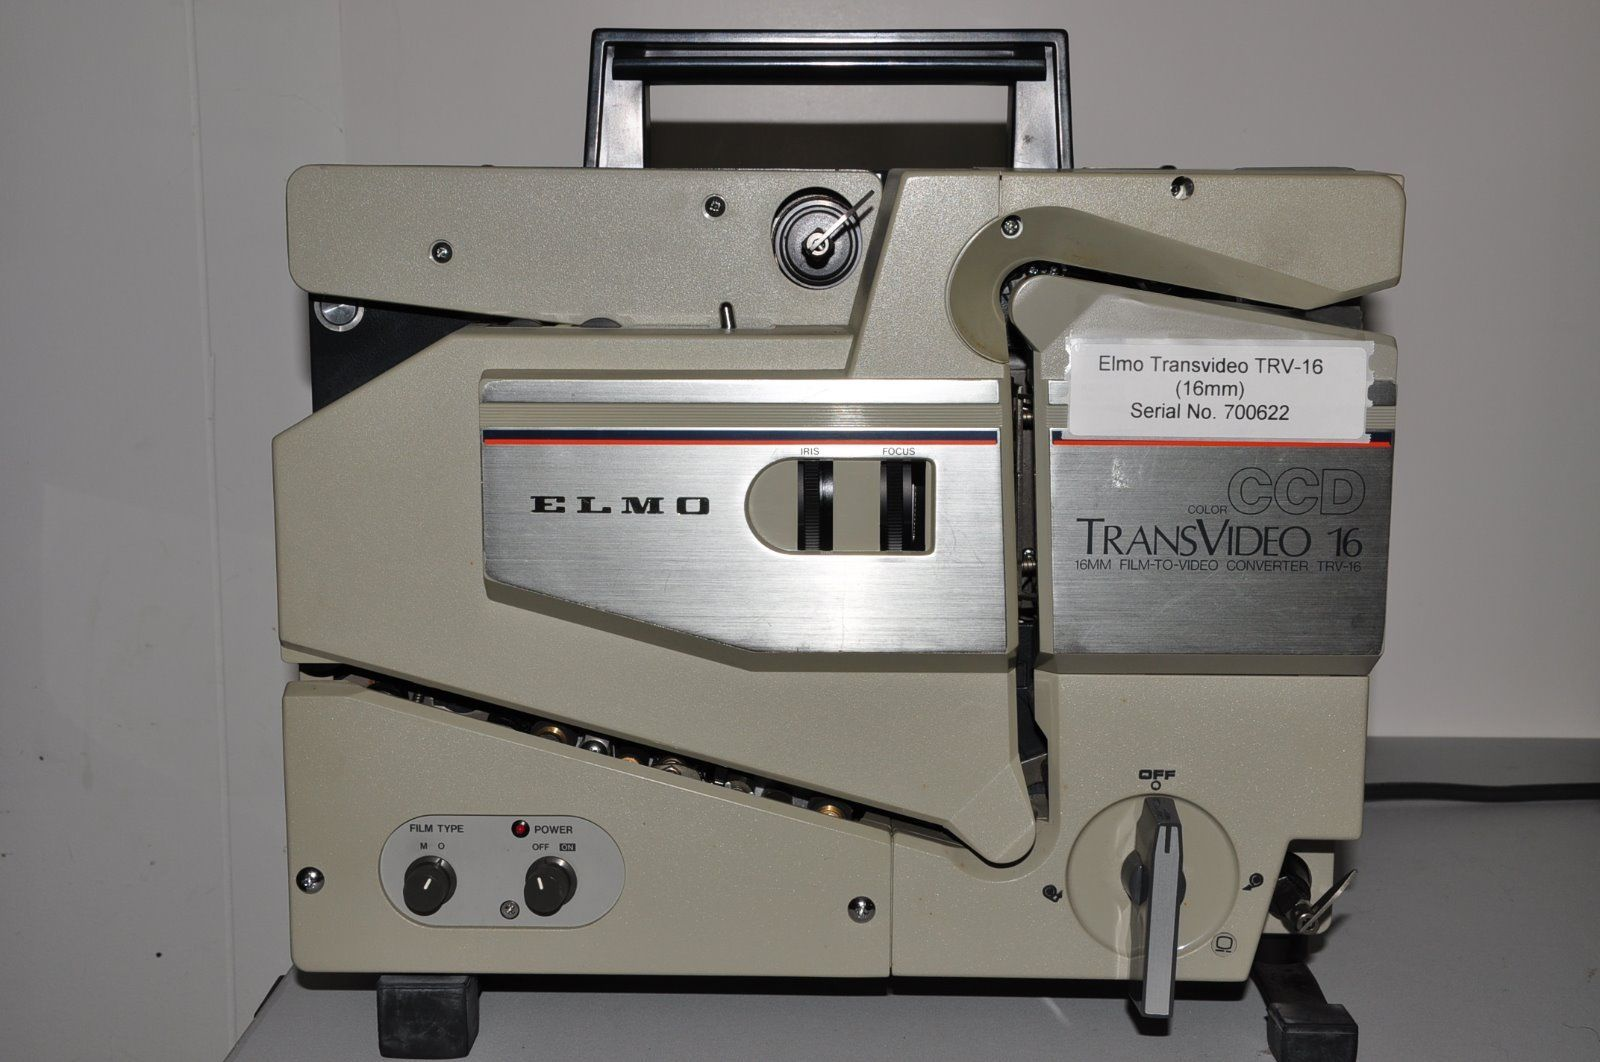 Elmo Transvideo 16mm